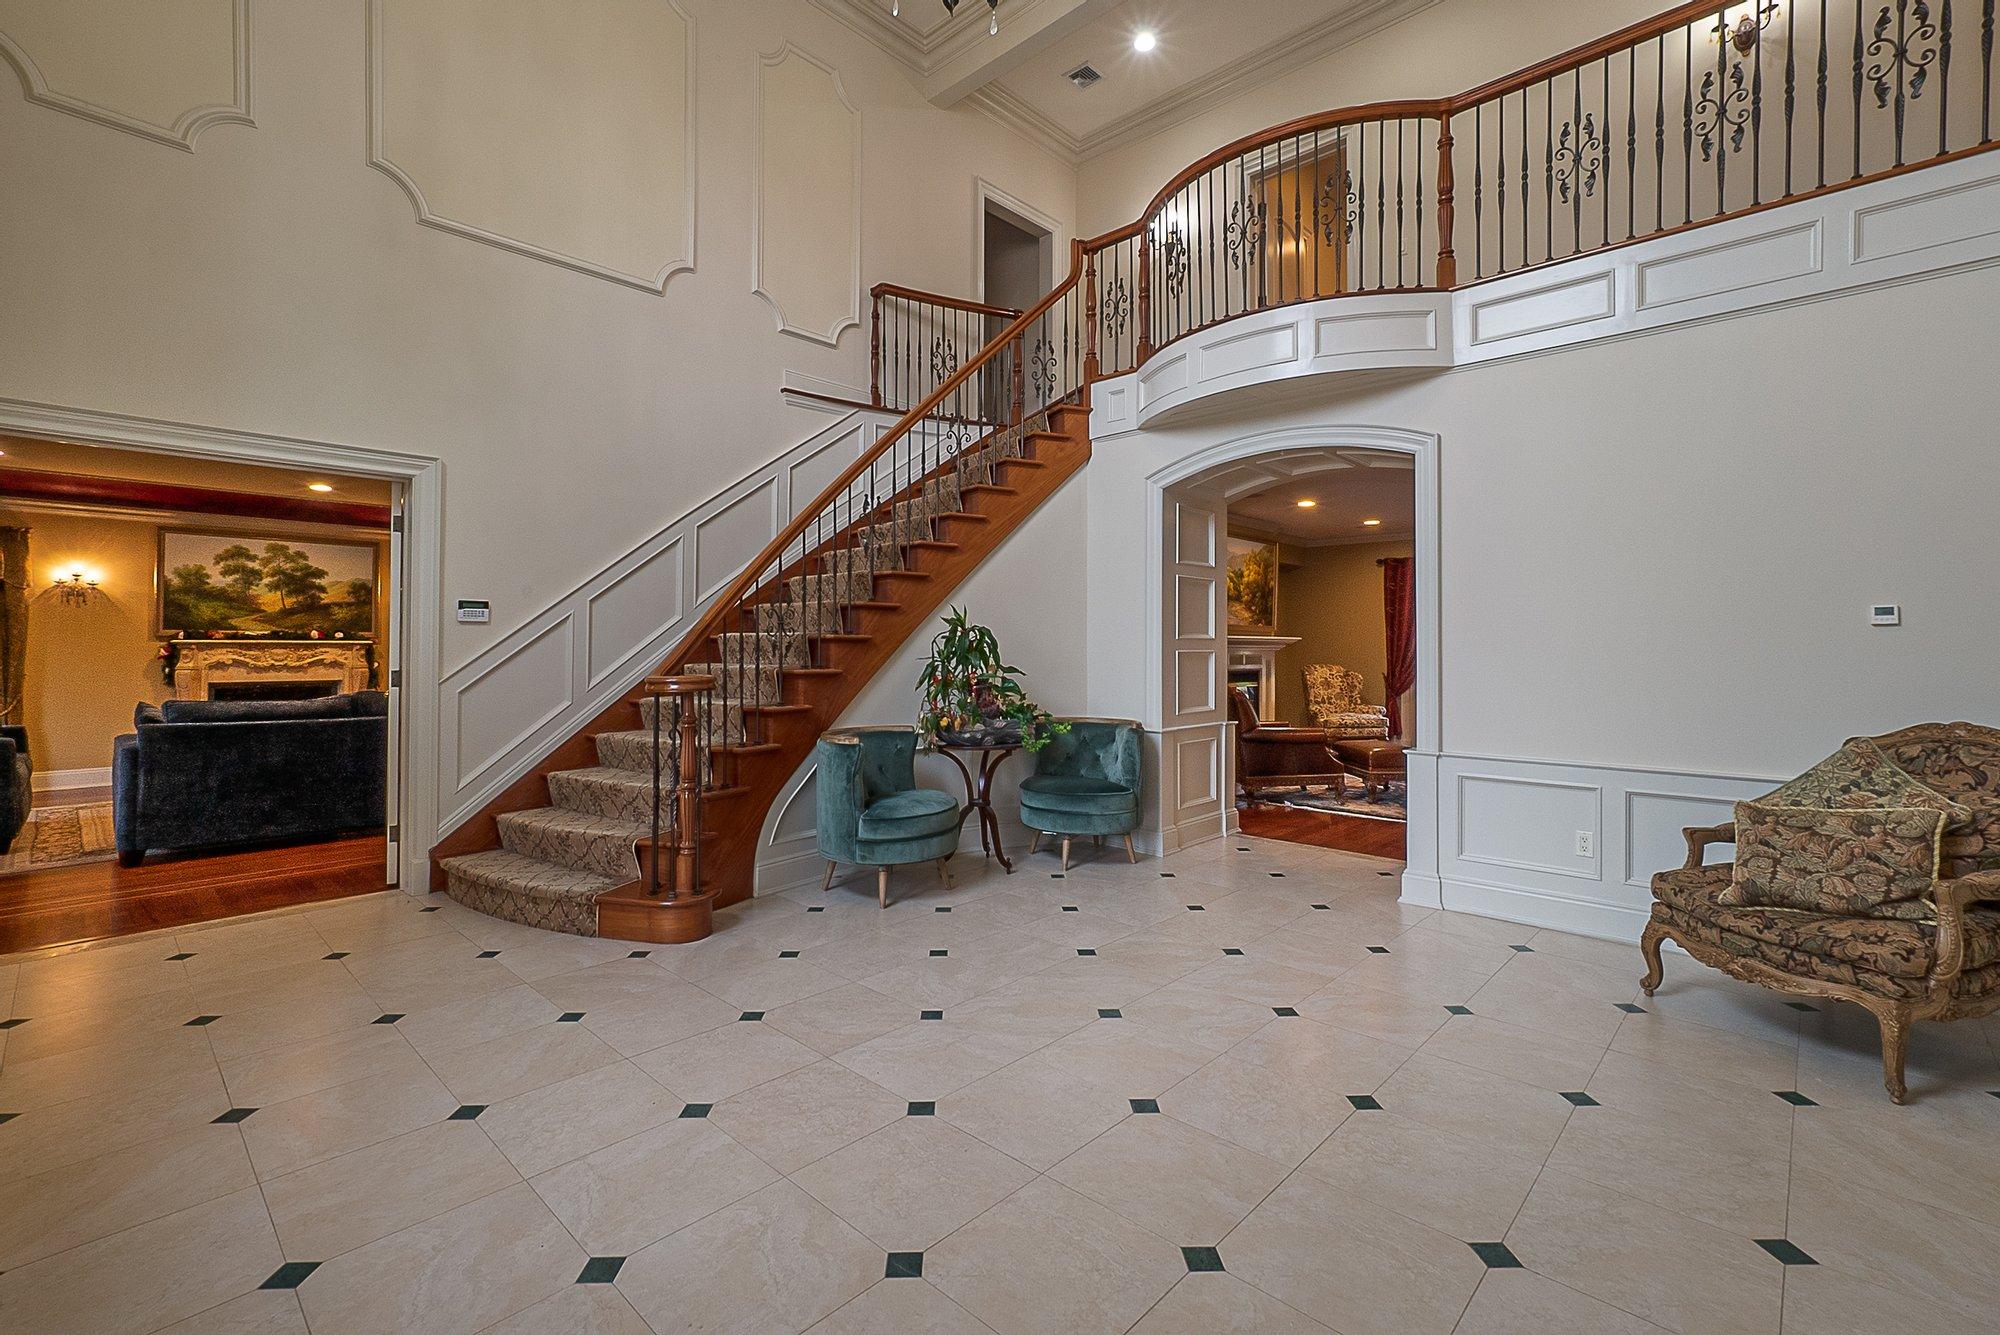 House in Woodbury, New York, United States 1 - 11243451